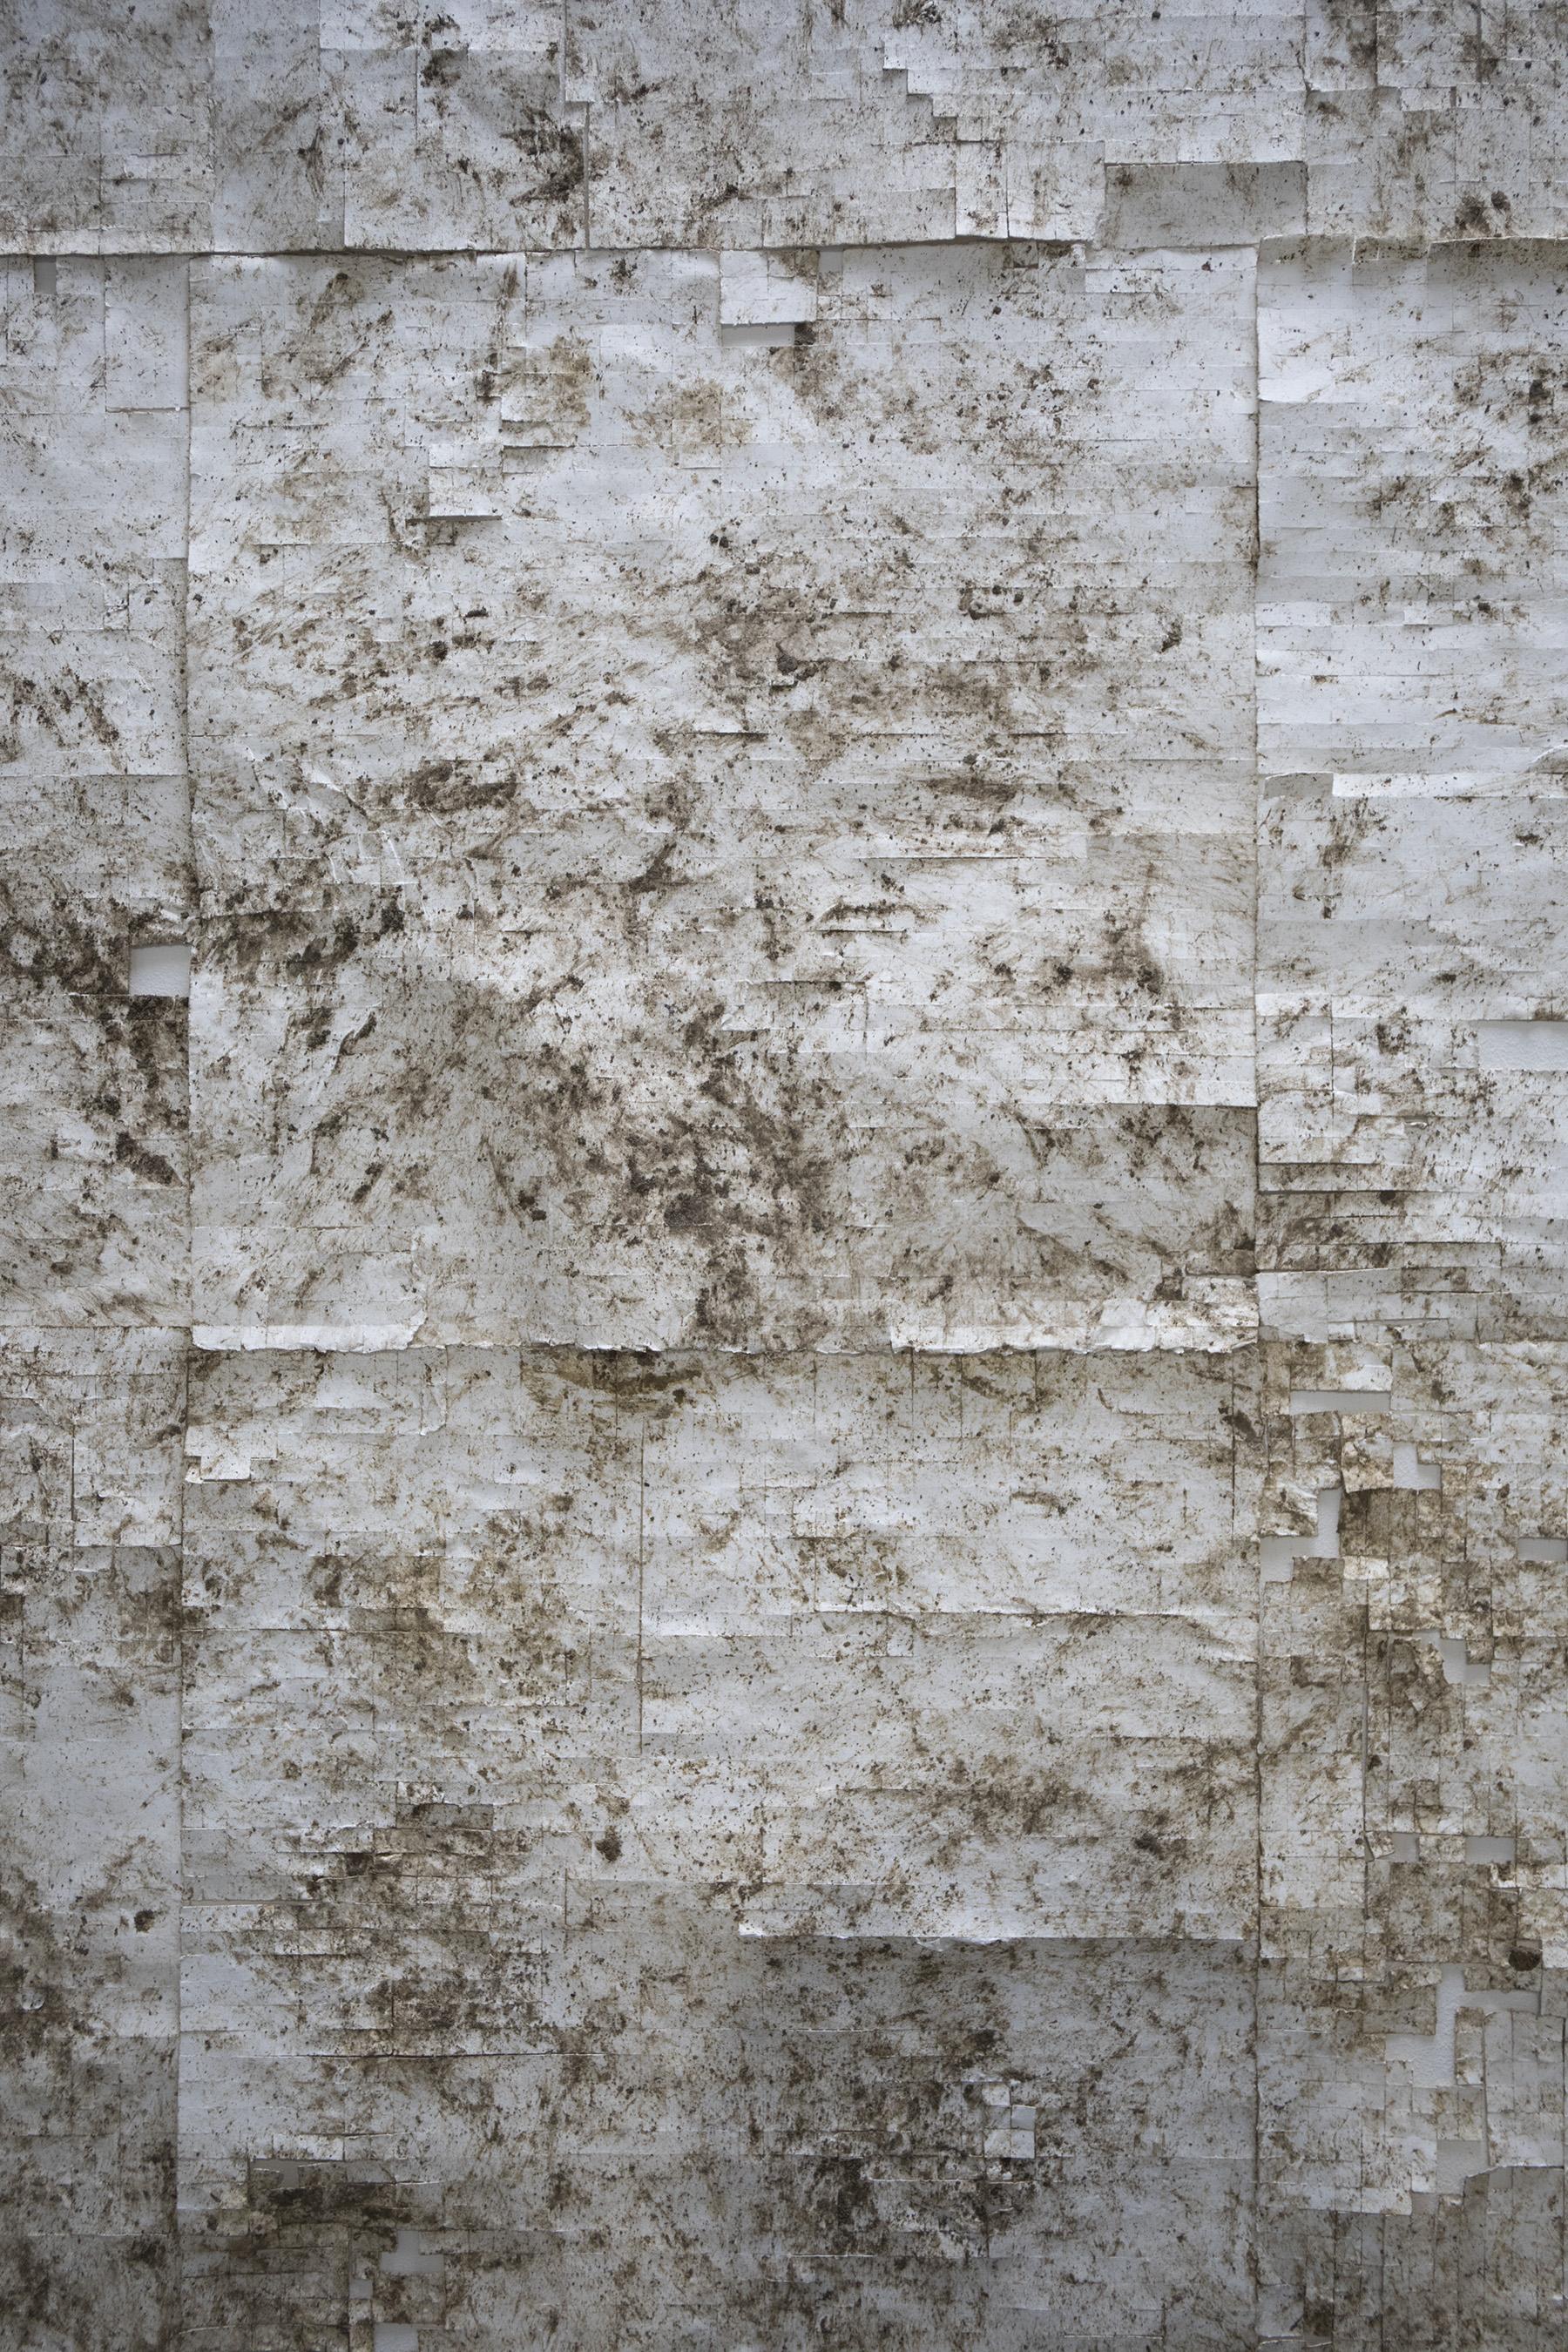 Nimesiscape (detail)